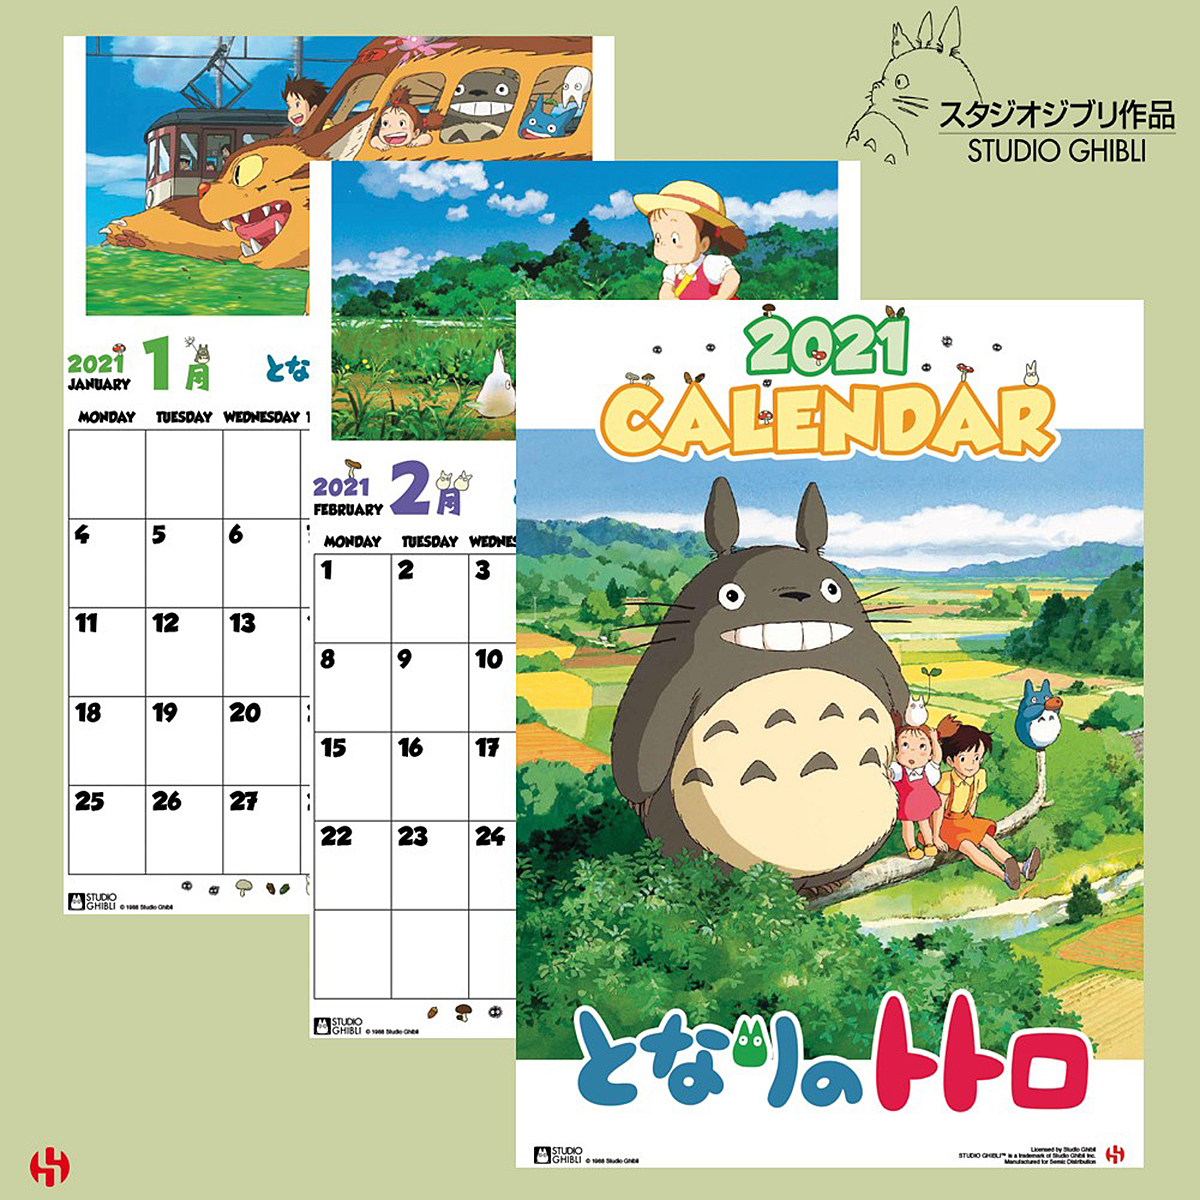 Studio Ghibli Totoro Special Calendar 2021 Kalender 2021